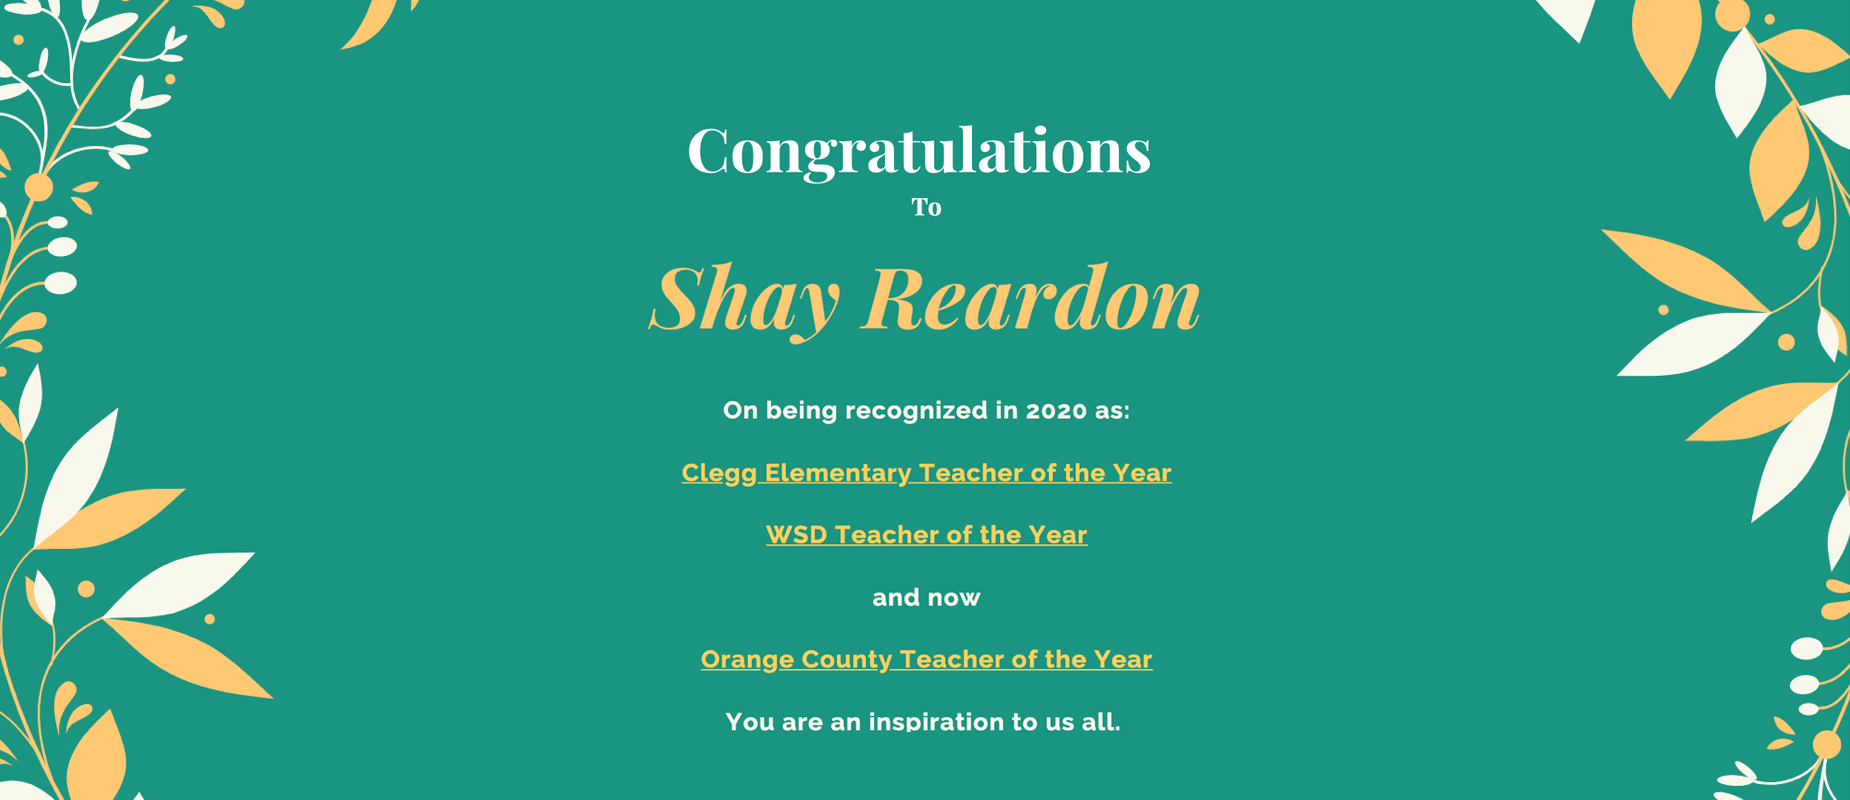 shay reardon teacher of the year image